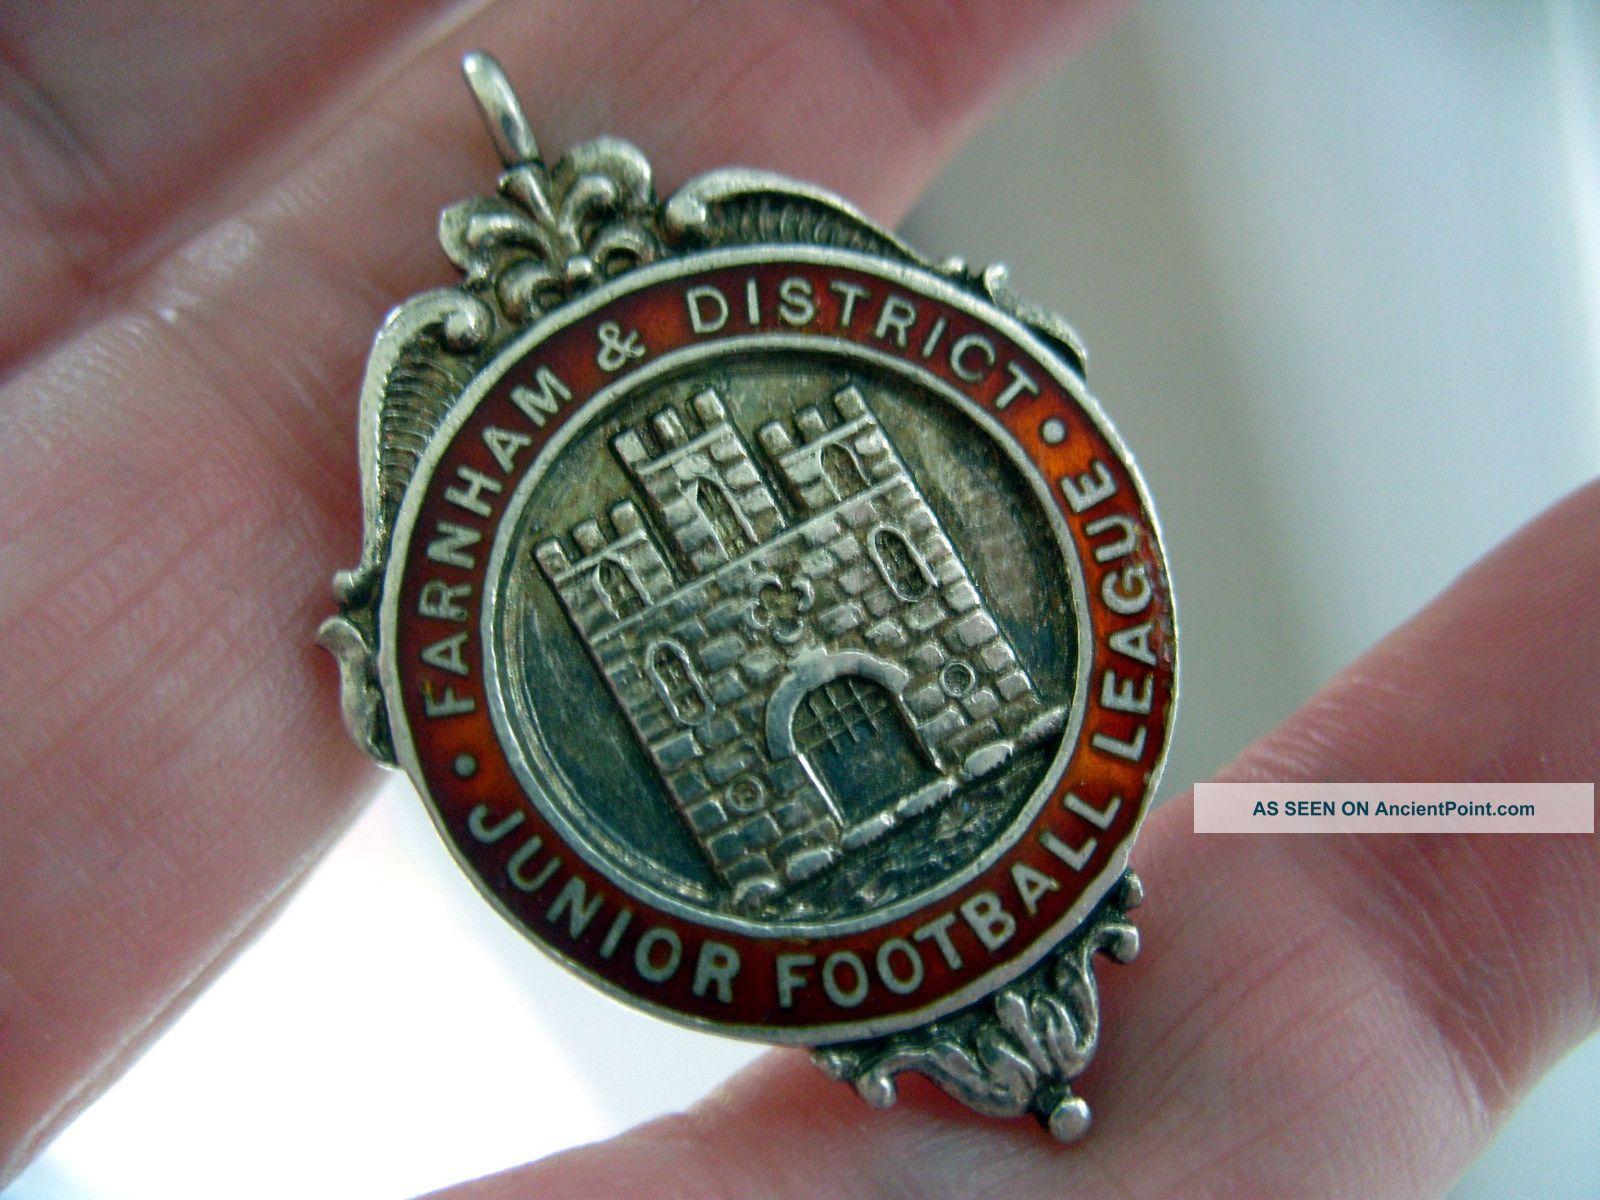 Antique 1937 Hallmark Silver Enamel Albert Watch Chain Farnham Football Fob Pocket Watches/ Chains/ Fobs photo